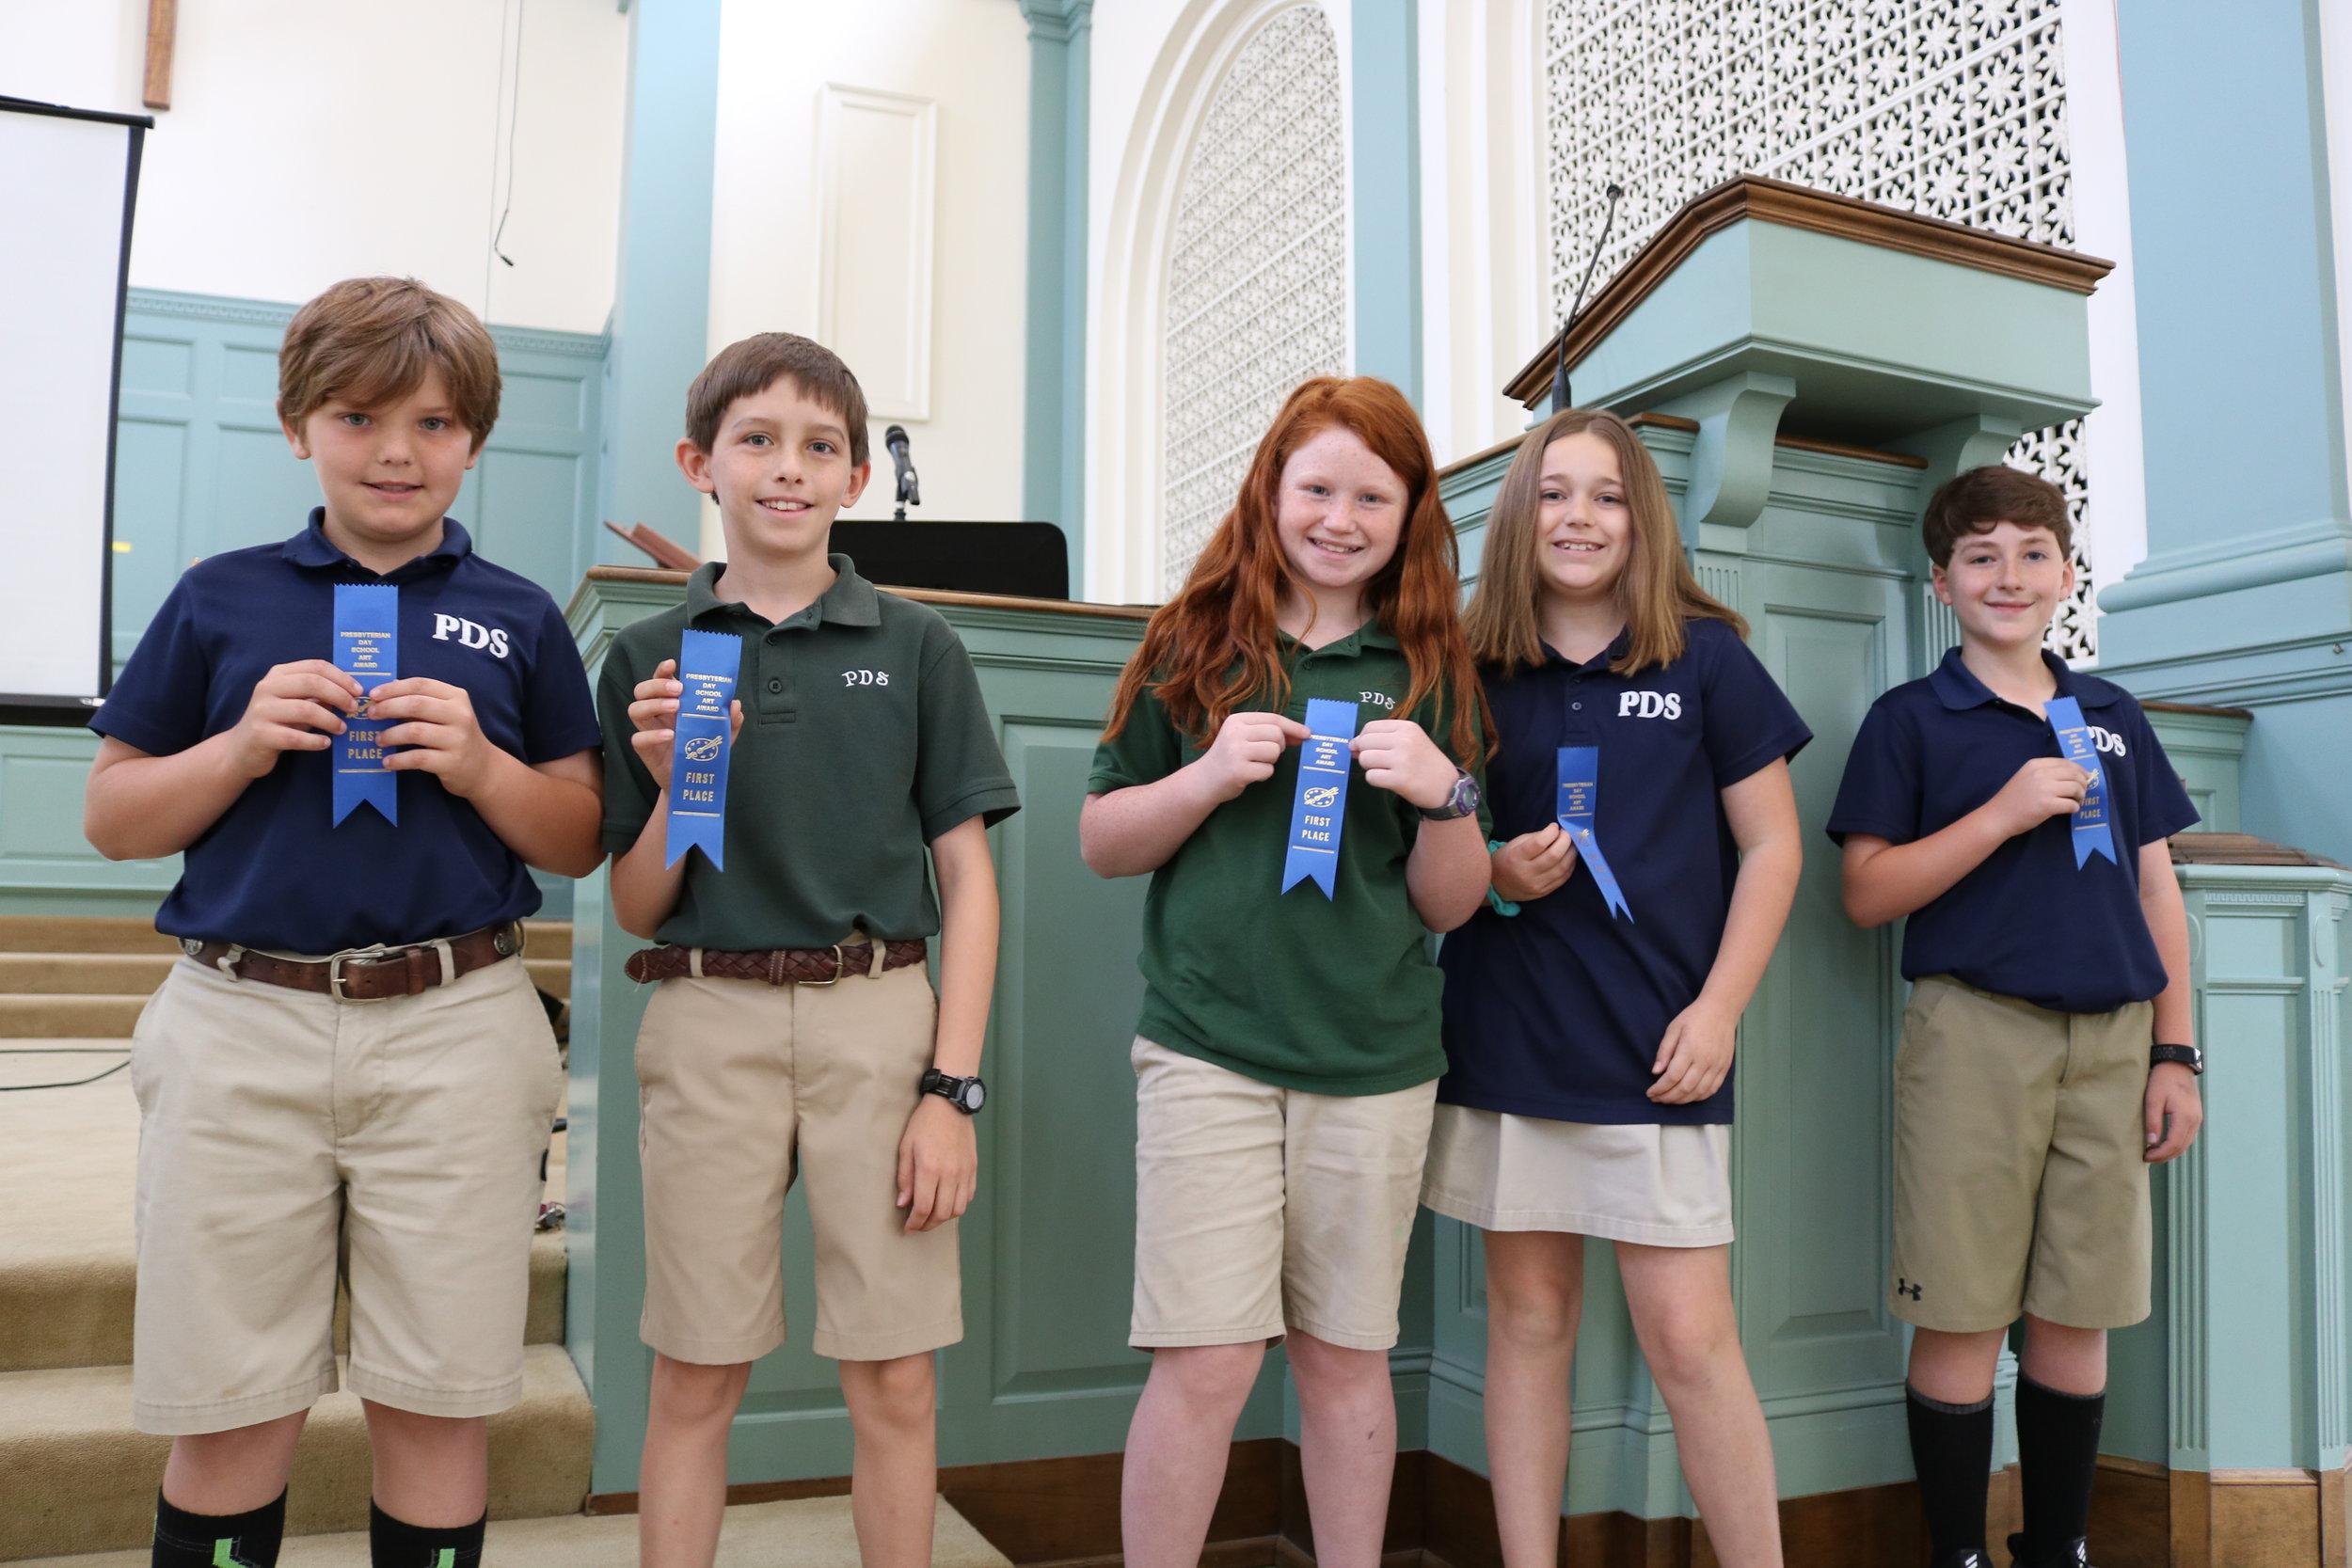 4th grade PDS winners